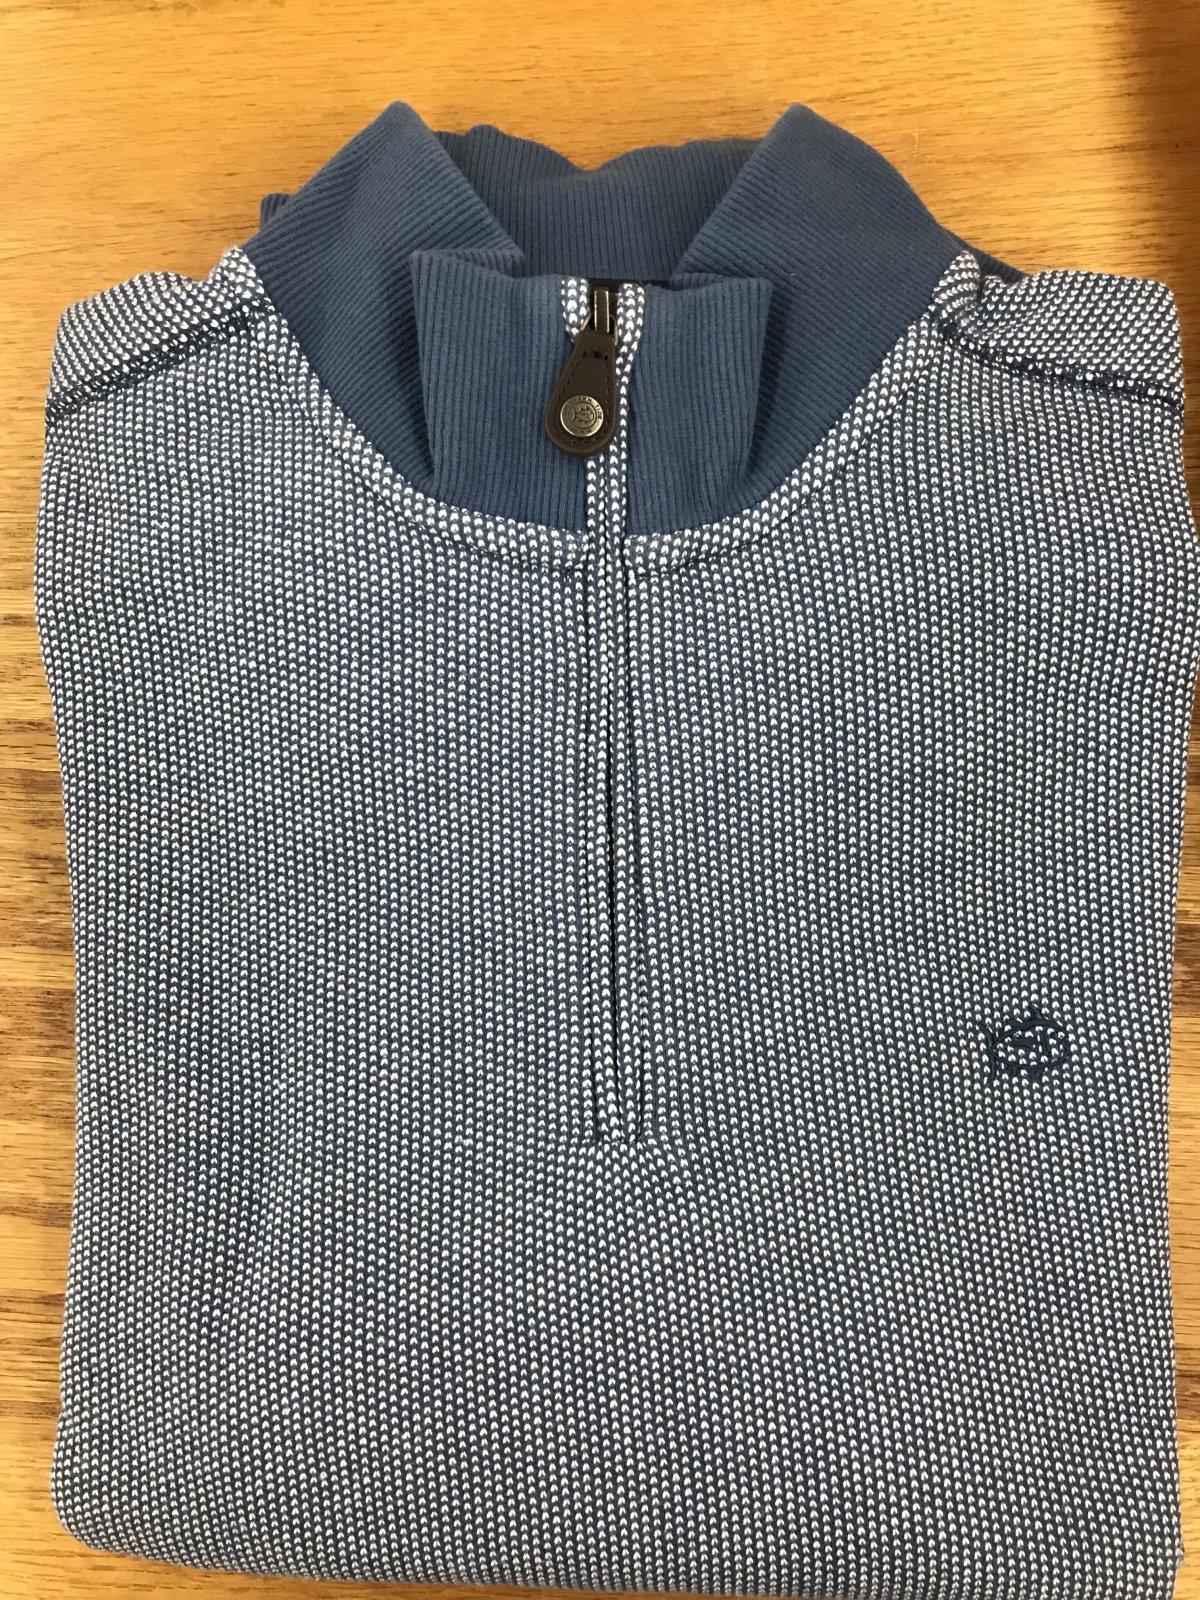 Southern Tide Fall 18 LS Gradient Hoodie T-Shirt